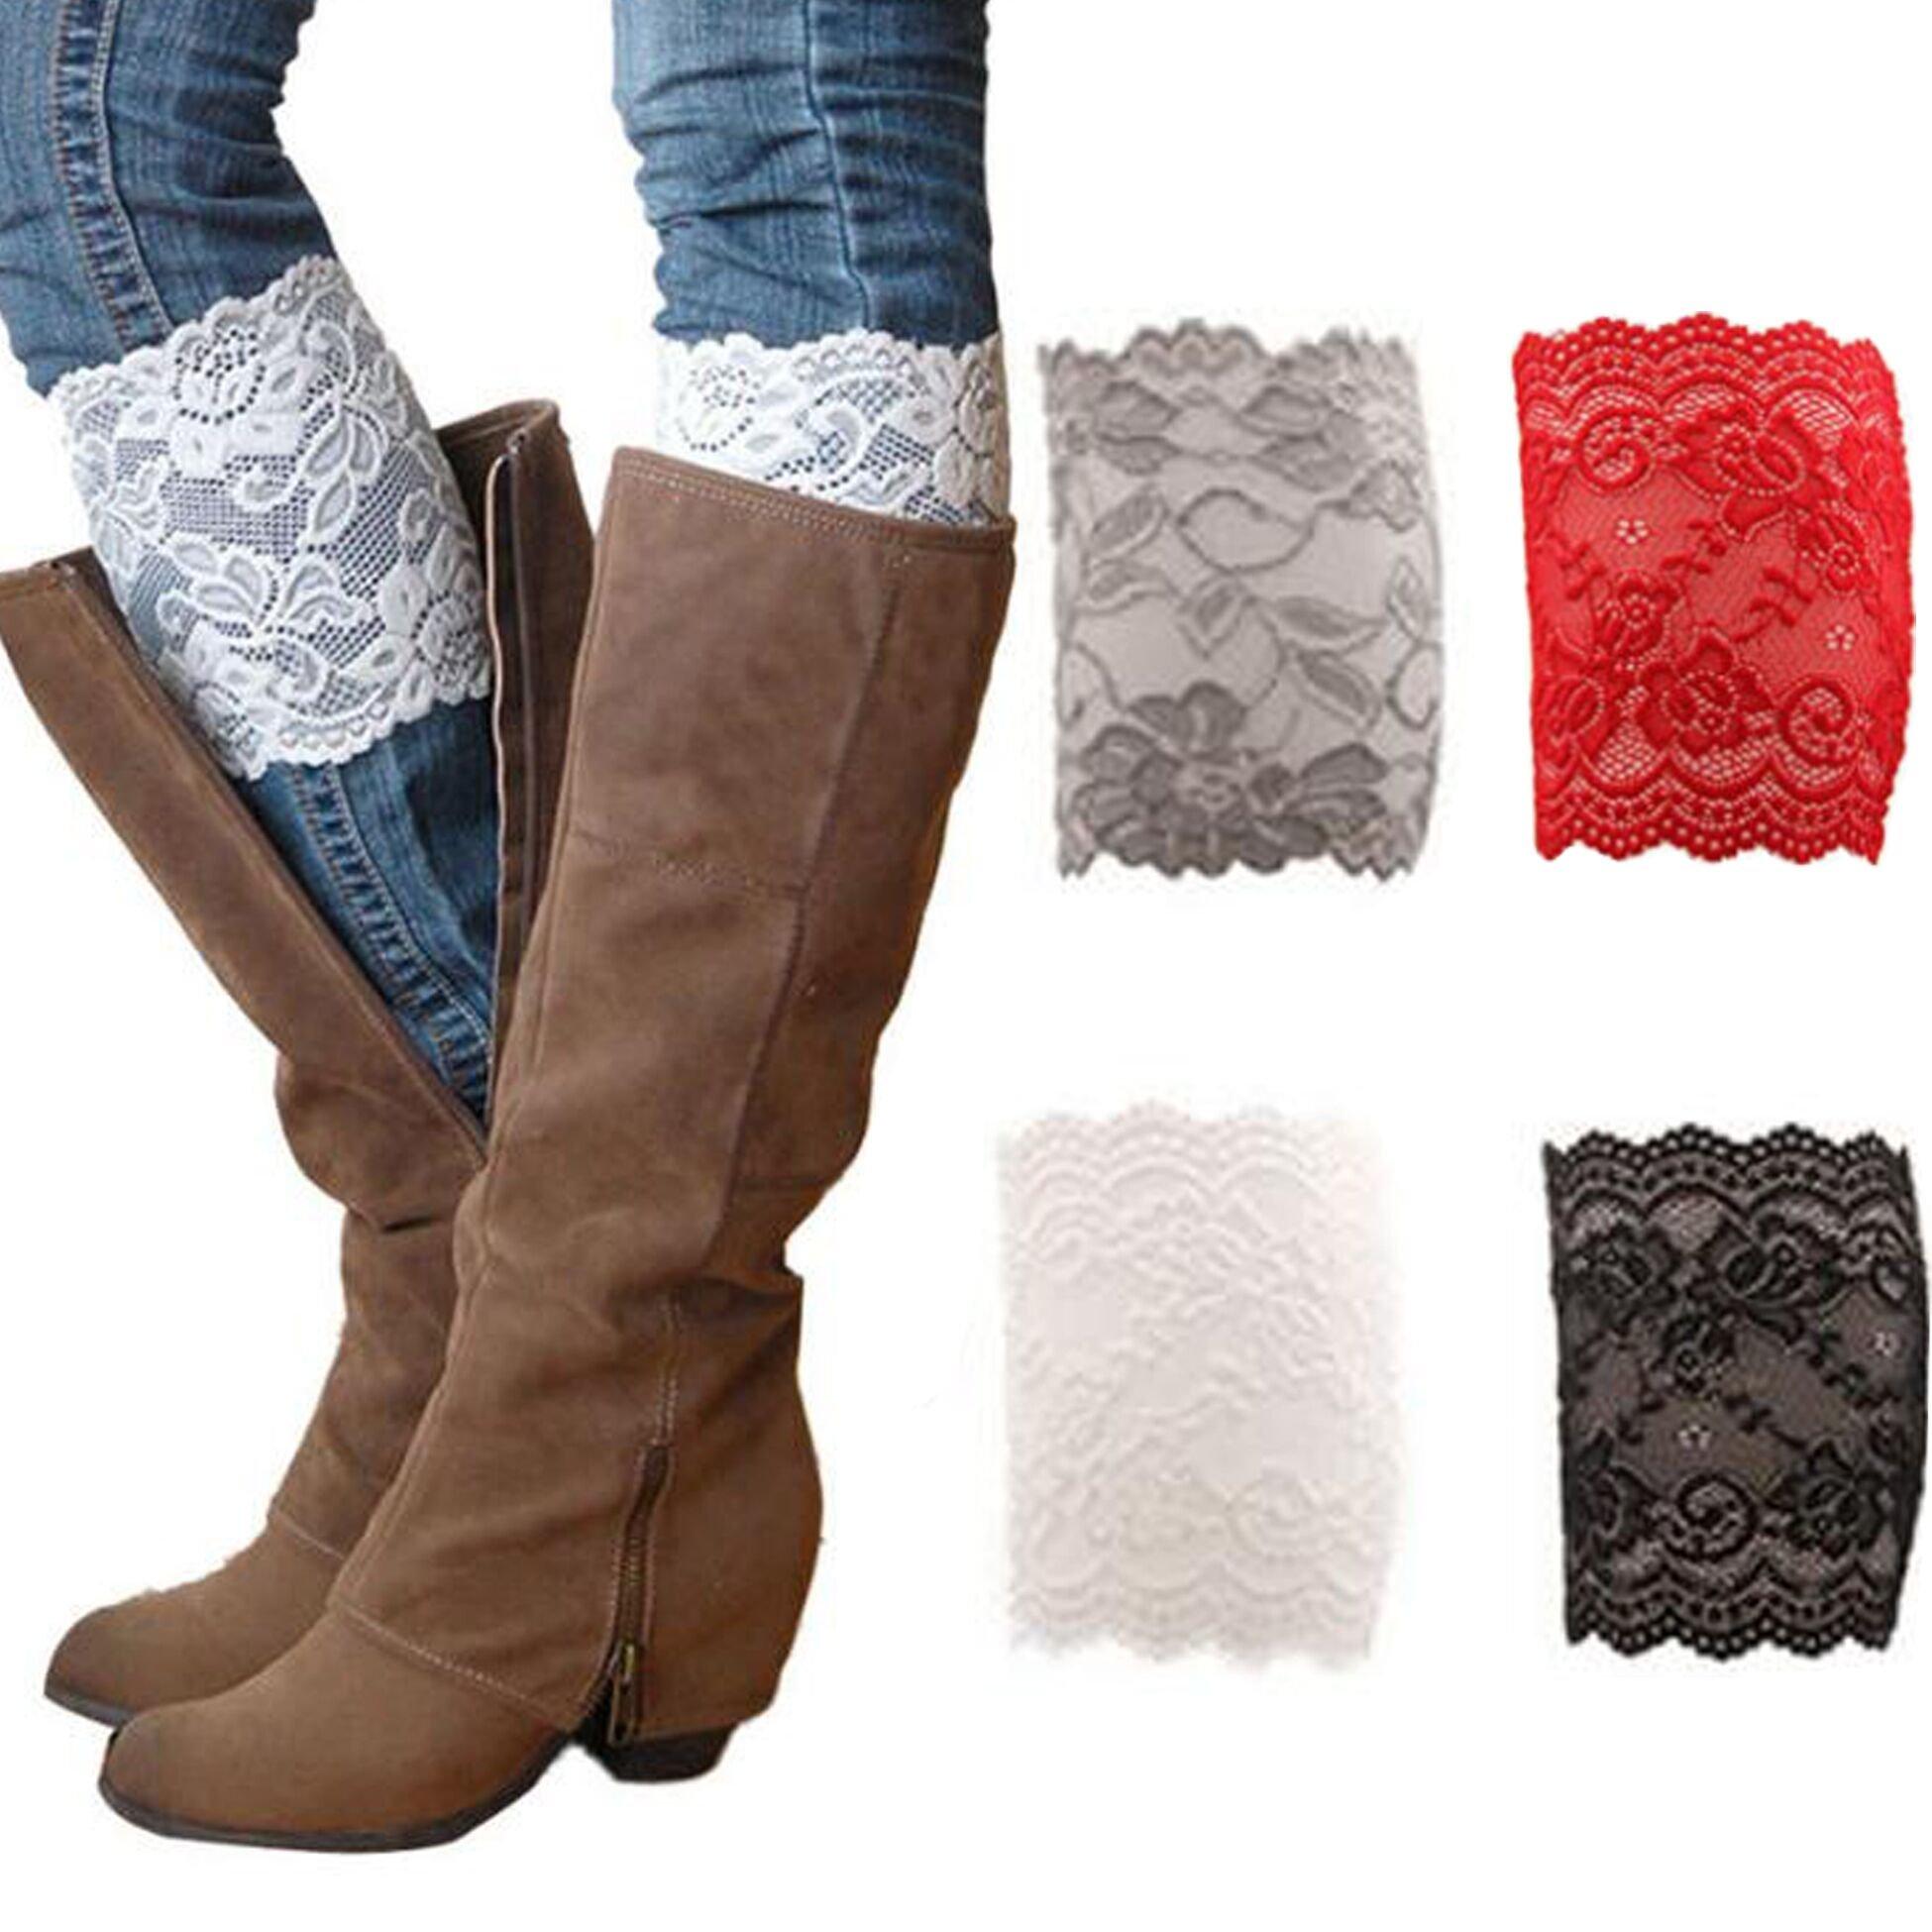 JALIYO Women Lace Floral Boot Cuffs Leg Warmer Socks 4 Pairs